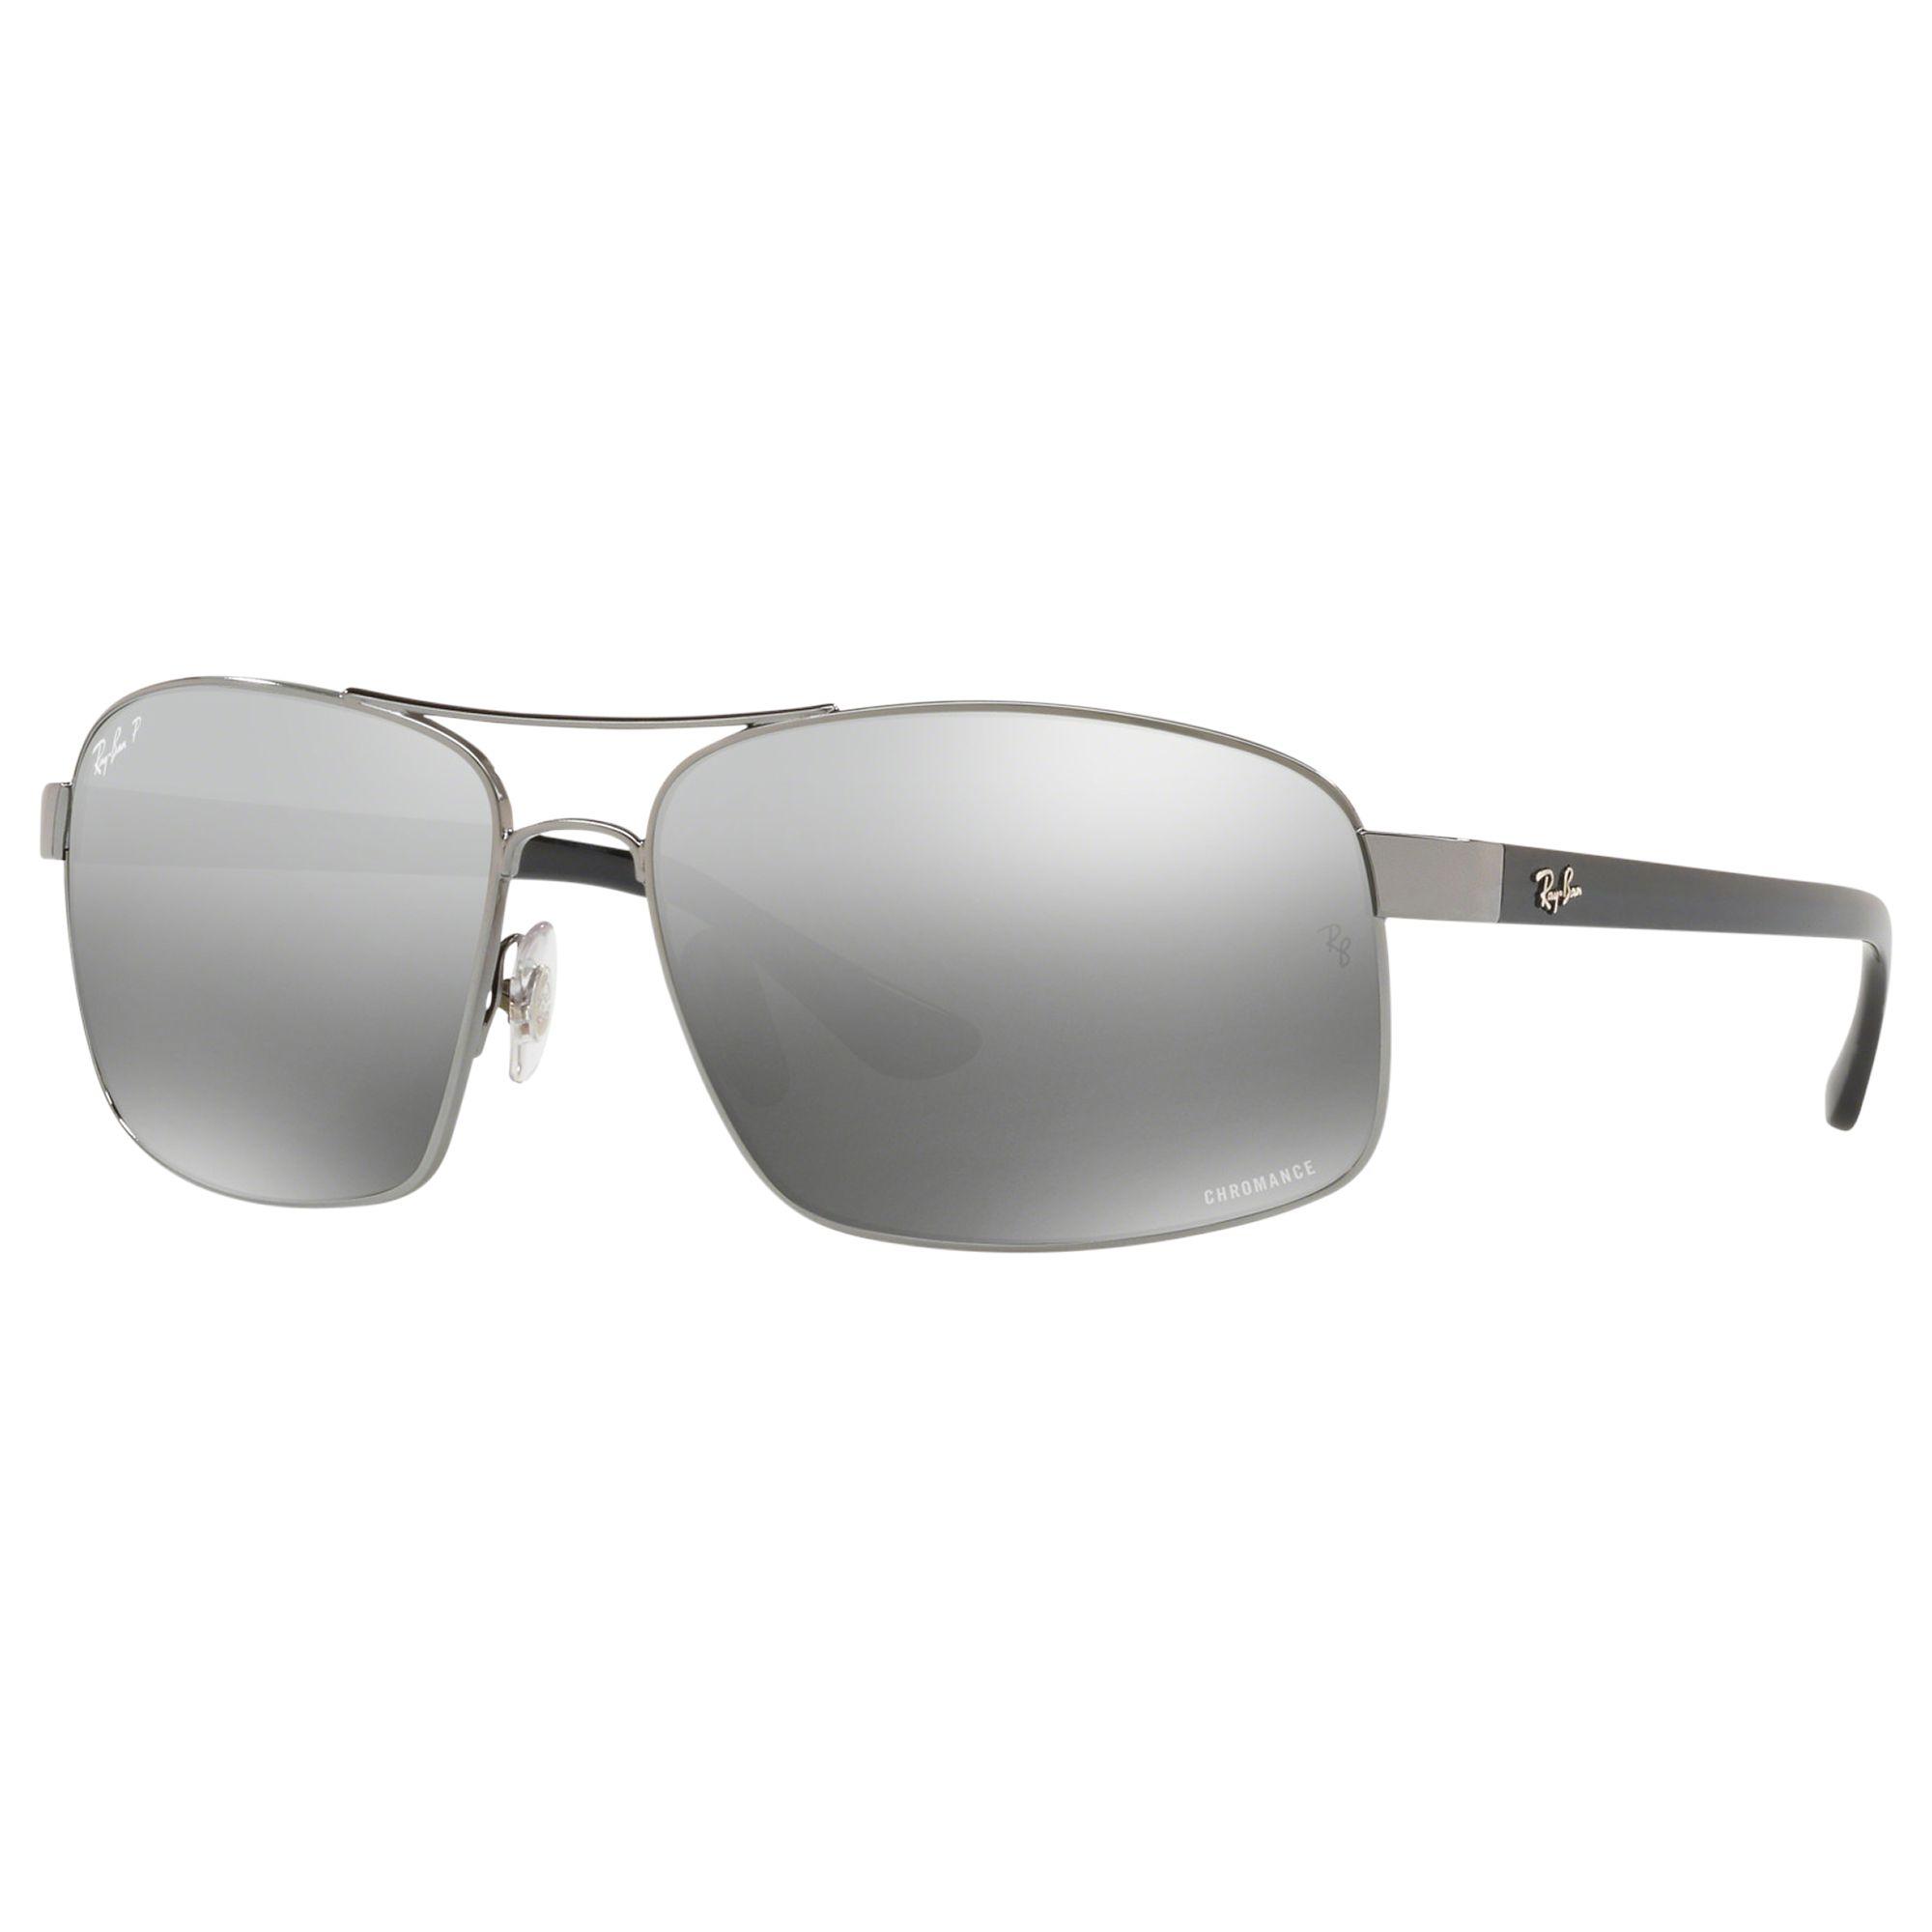 3d221873278 Ray-Ban RB3604 Men s Square Sunglasses